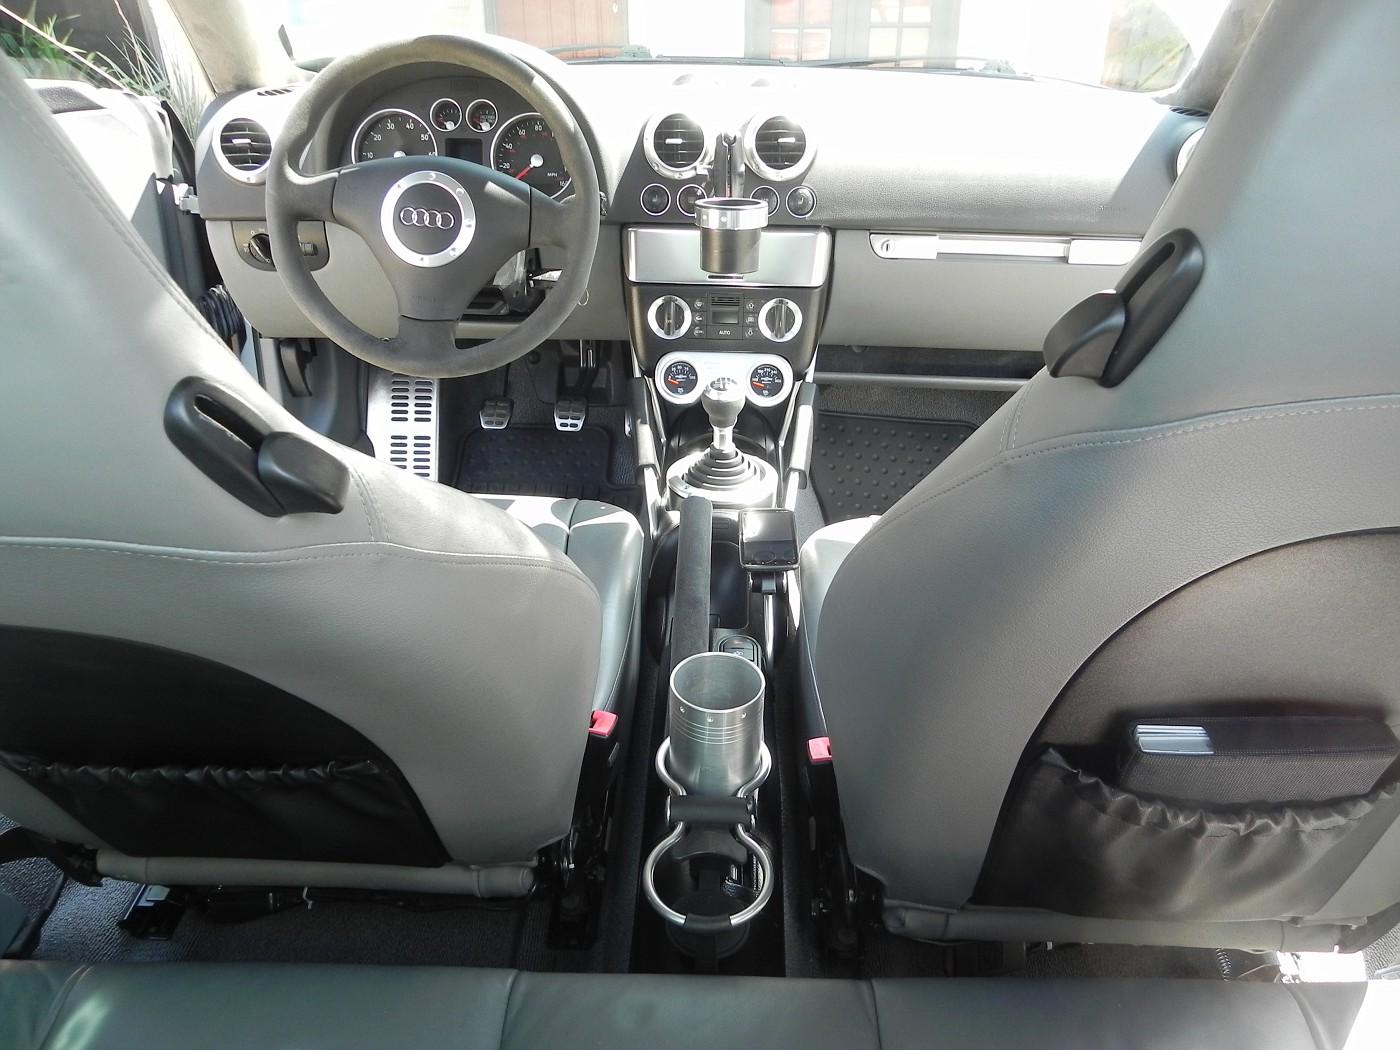 The Audi TT Forum • View topic - Full Interior/dash swap (light grey)